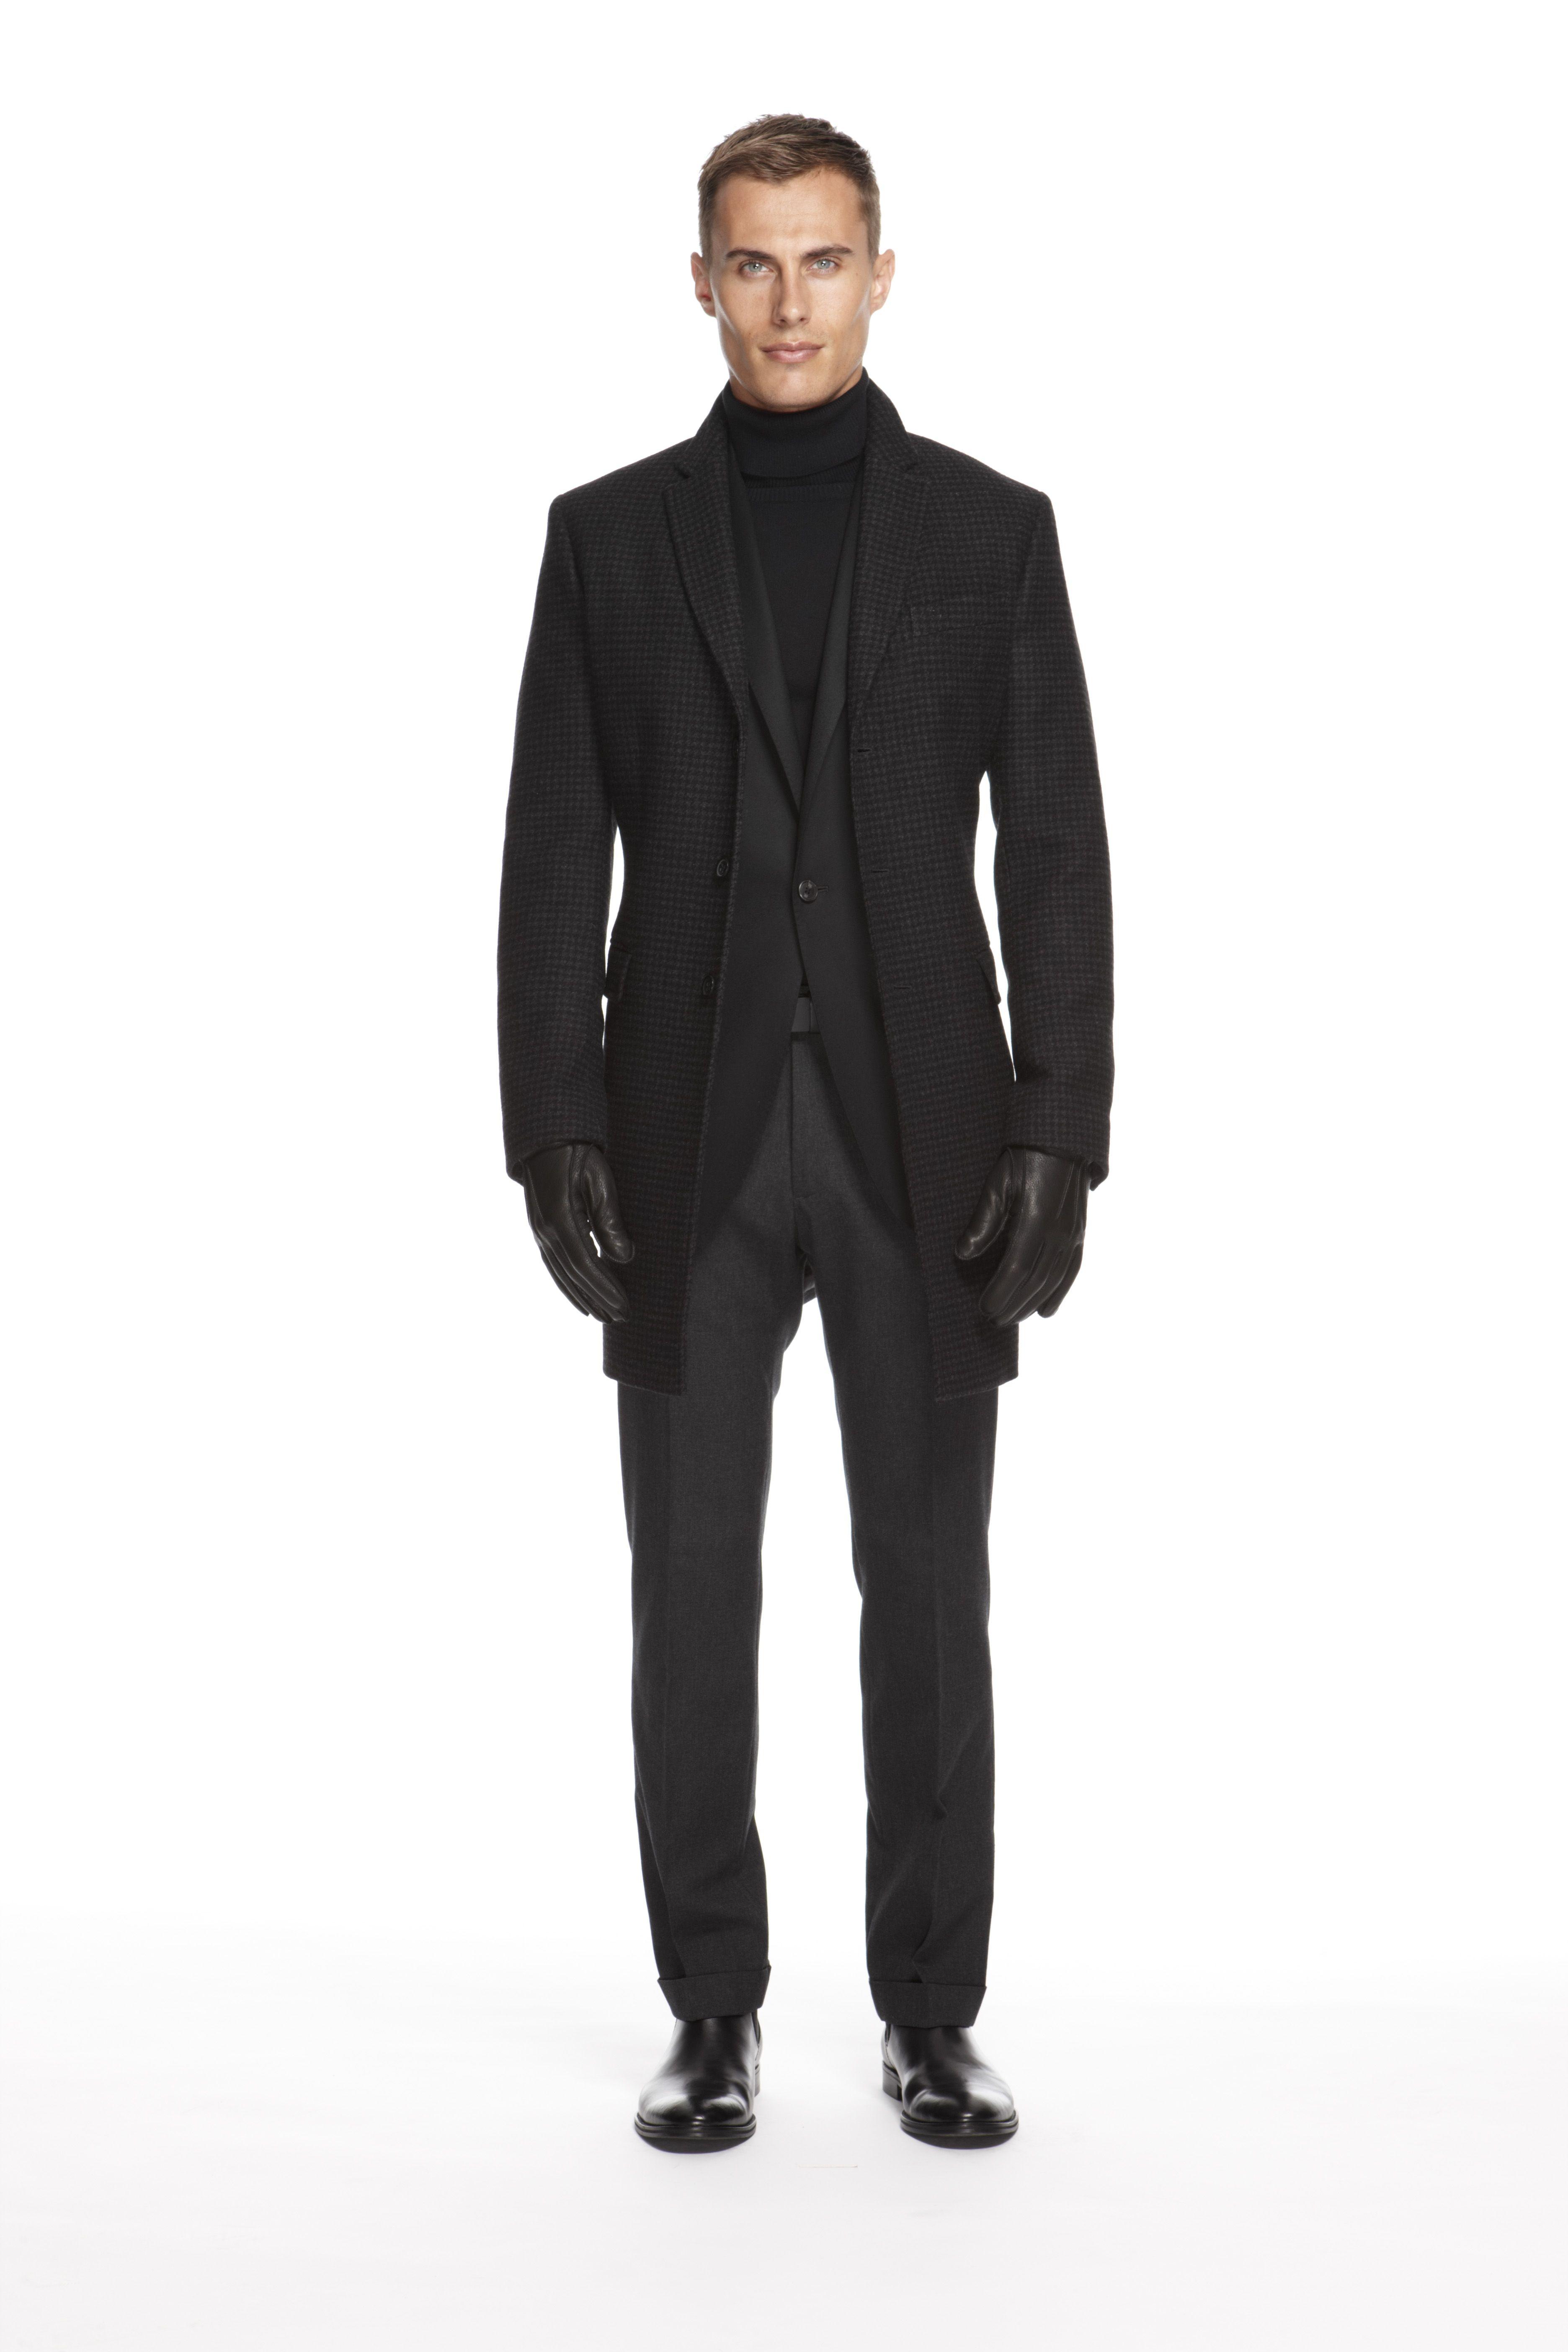 000ba27bcb7a #BRAnnaK #BananaRepublic Charcoal Wool Houndstooth Top Coat - Black Monogram  Flannel Single-Breasted Jacket - Black Slim-Fit Turtleneck - Charcoal ...